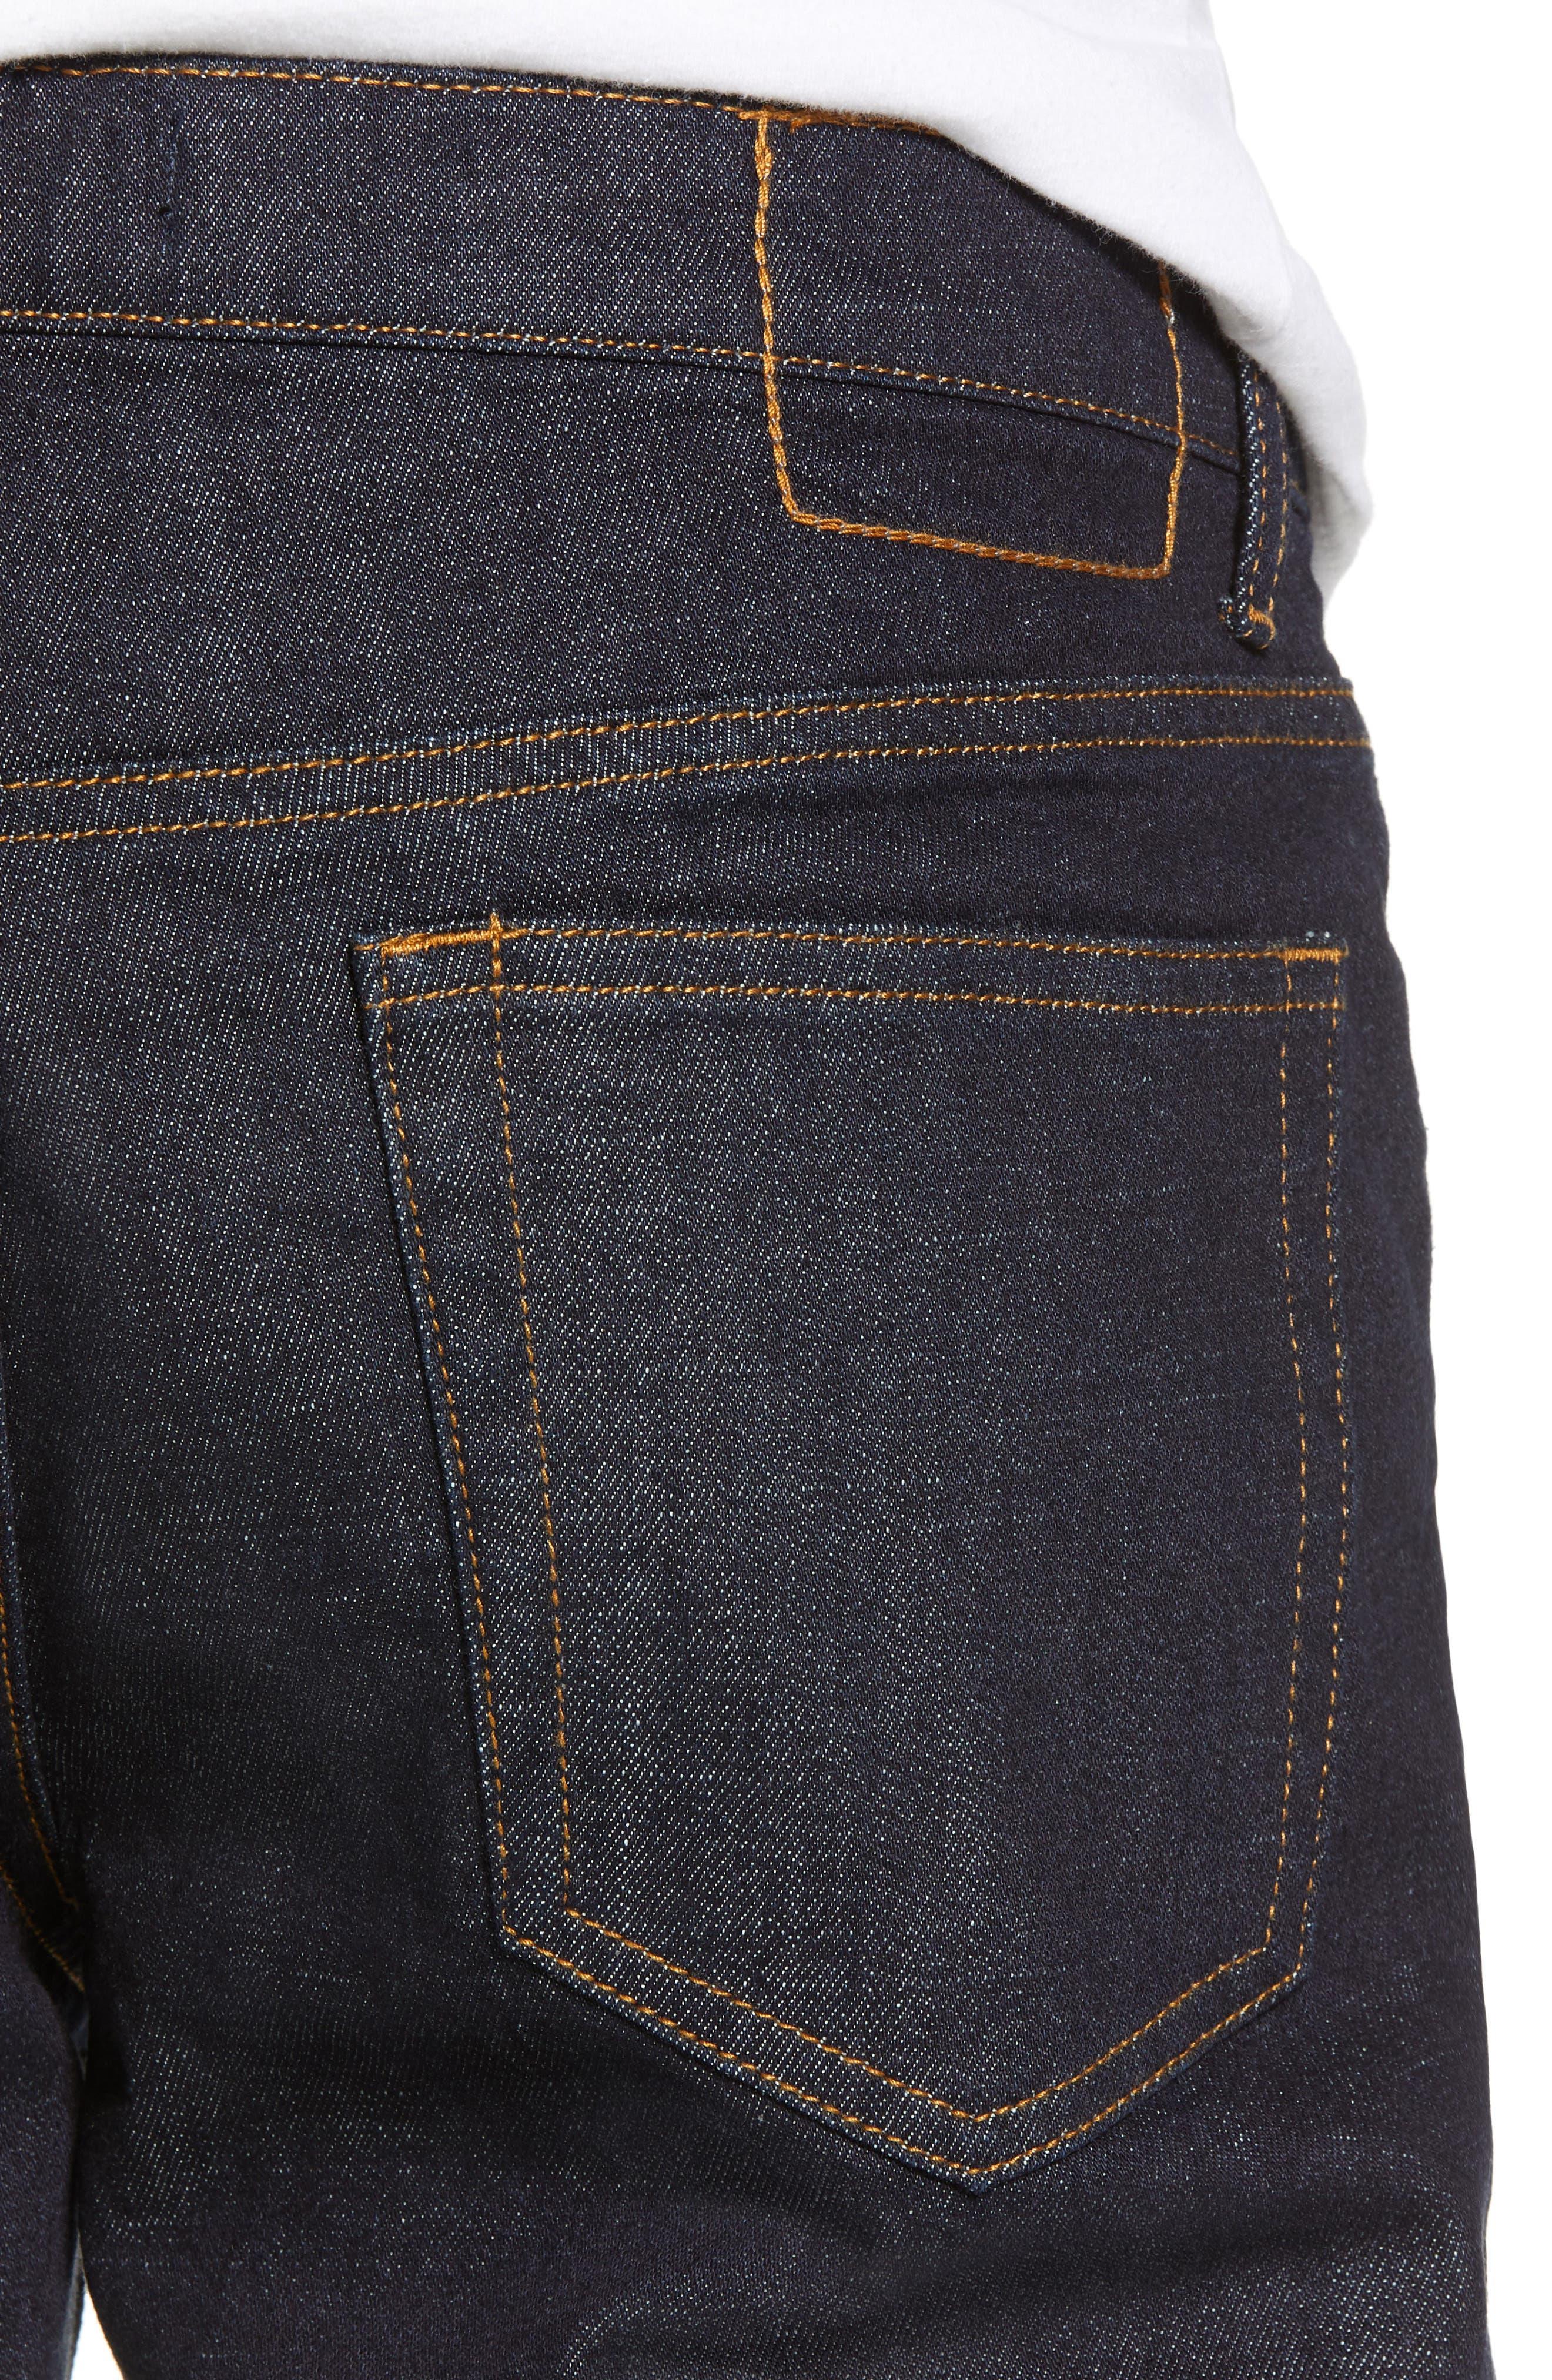 THE RAIL, Stretch Slim Leg Jeans, Alternate thumbnail 5, color, BLUE PERRY WASH